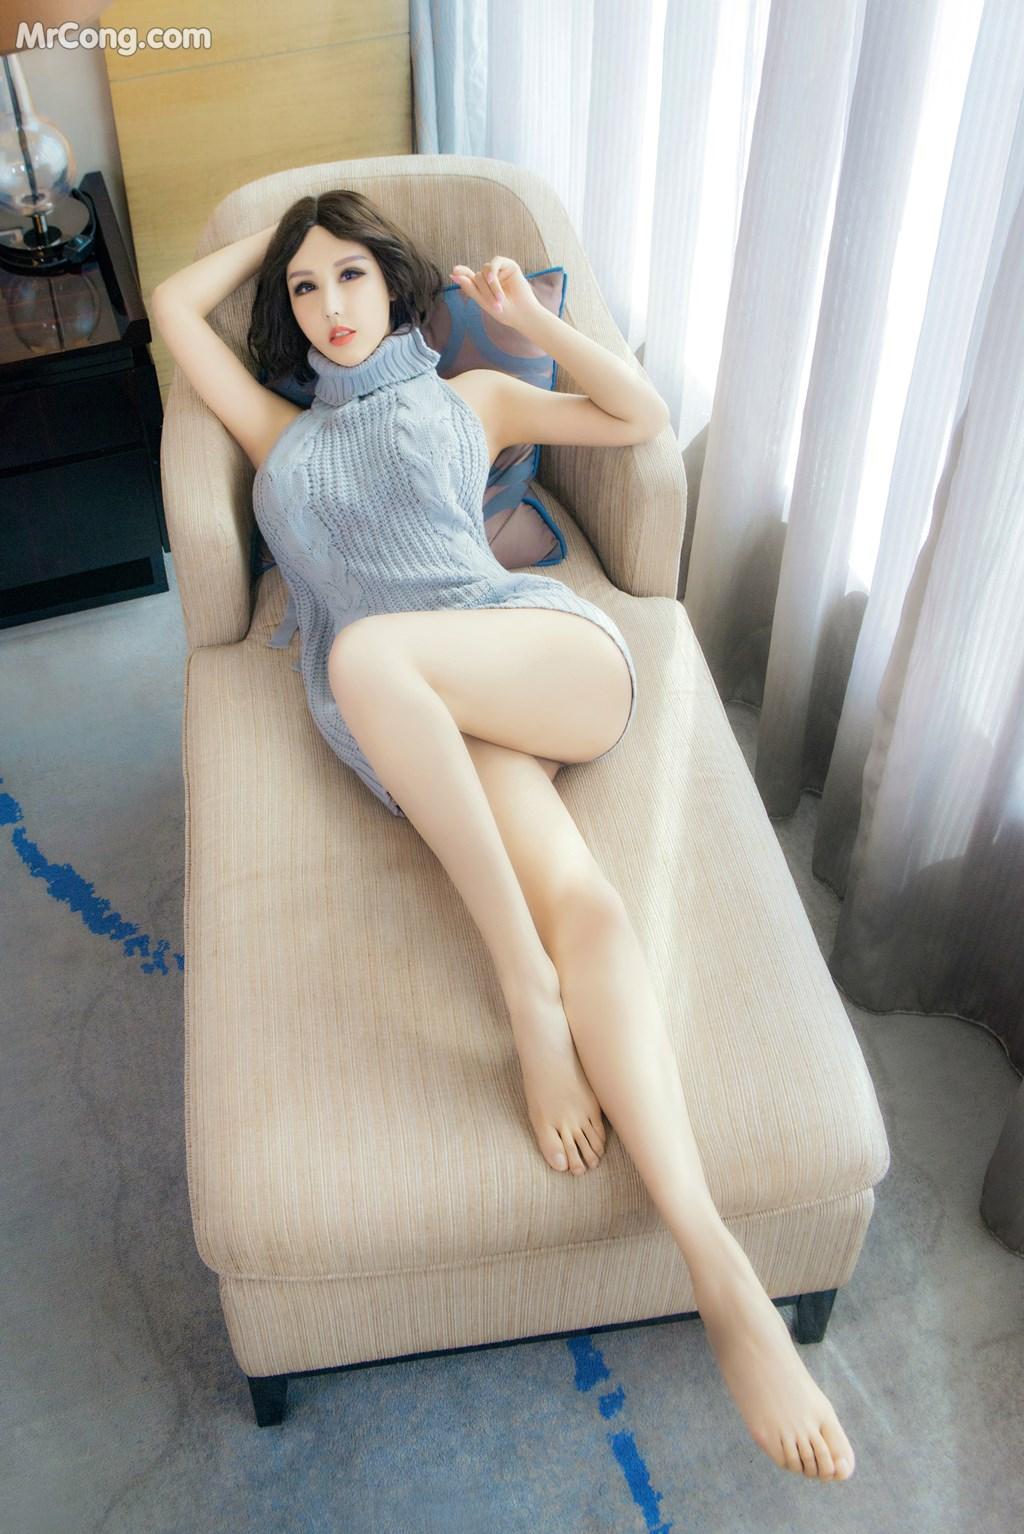 Image SLADY-2017-05-27-No.011-Na-Yi-Ling-Er-MrCong.com-002 in post SLADY 2017-05-27 No.011: Người mẫu Na Yi Ling Er (娜依灵儿) (54 ảnh)